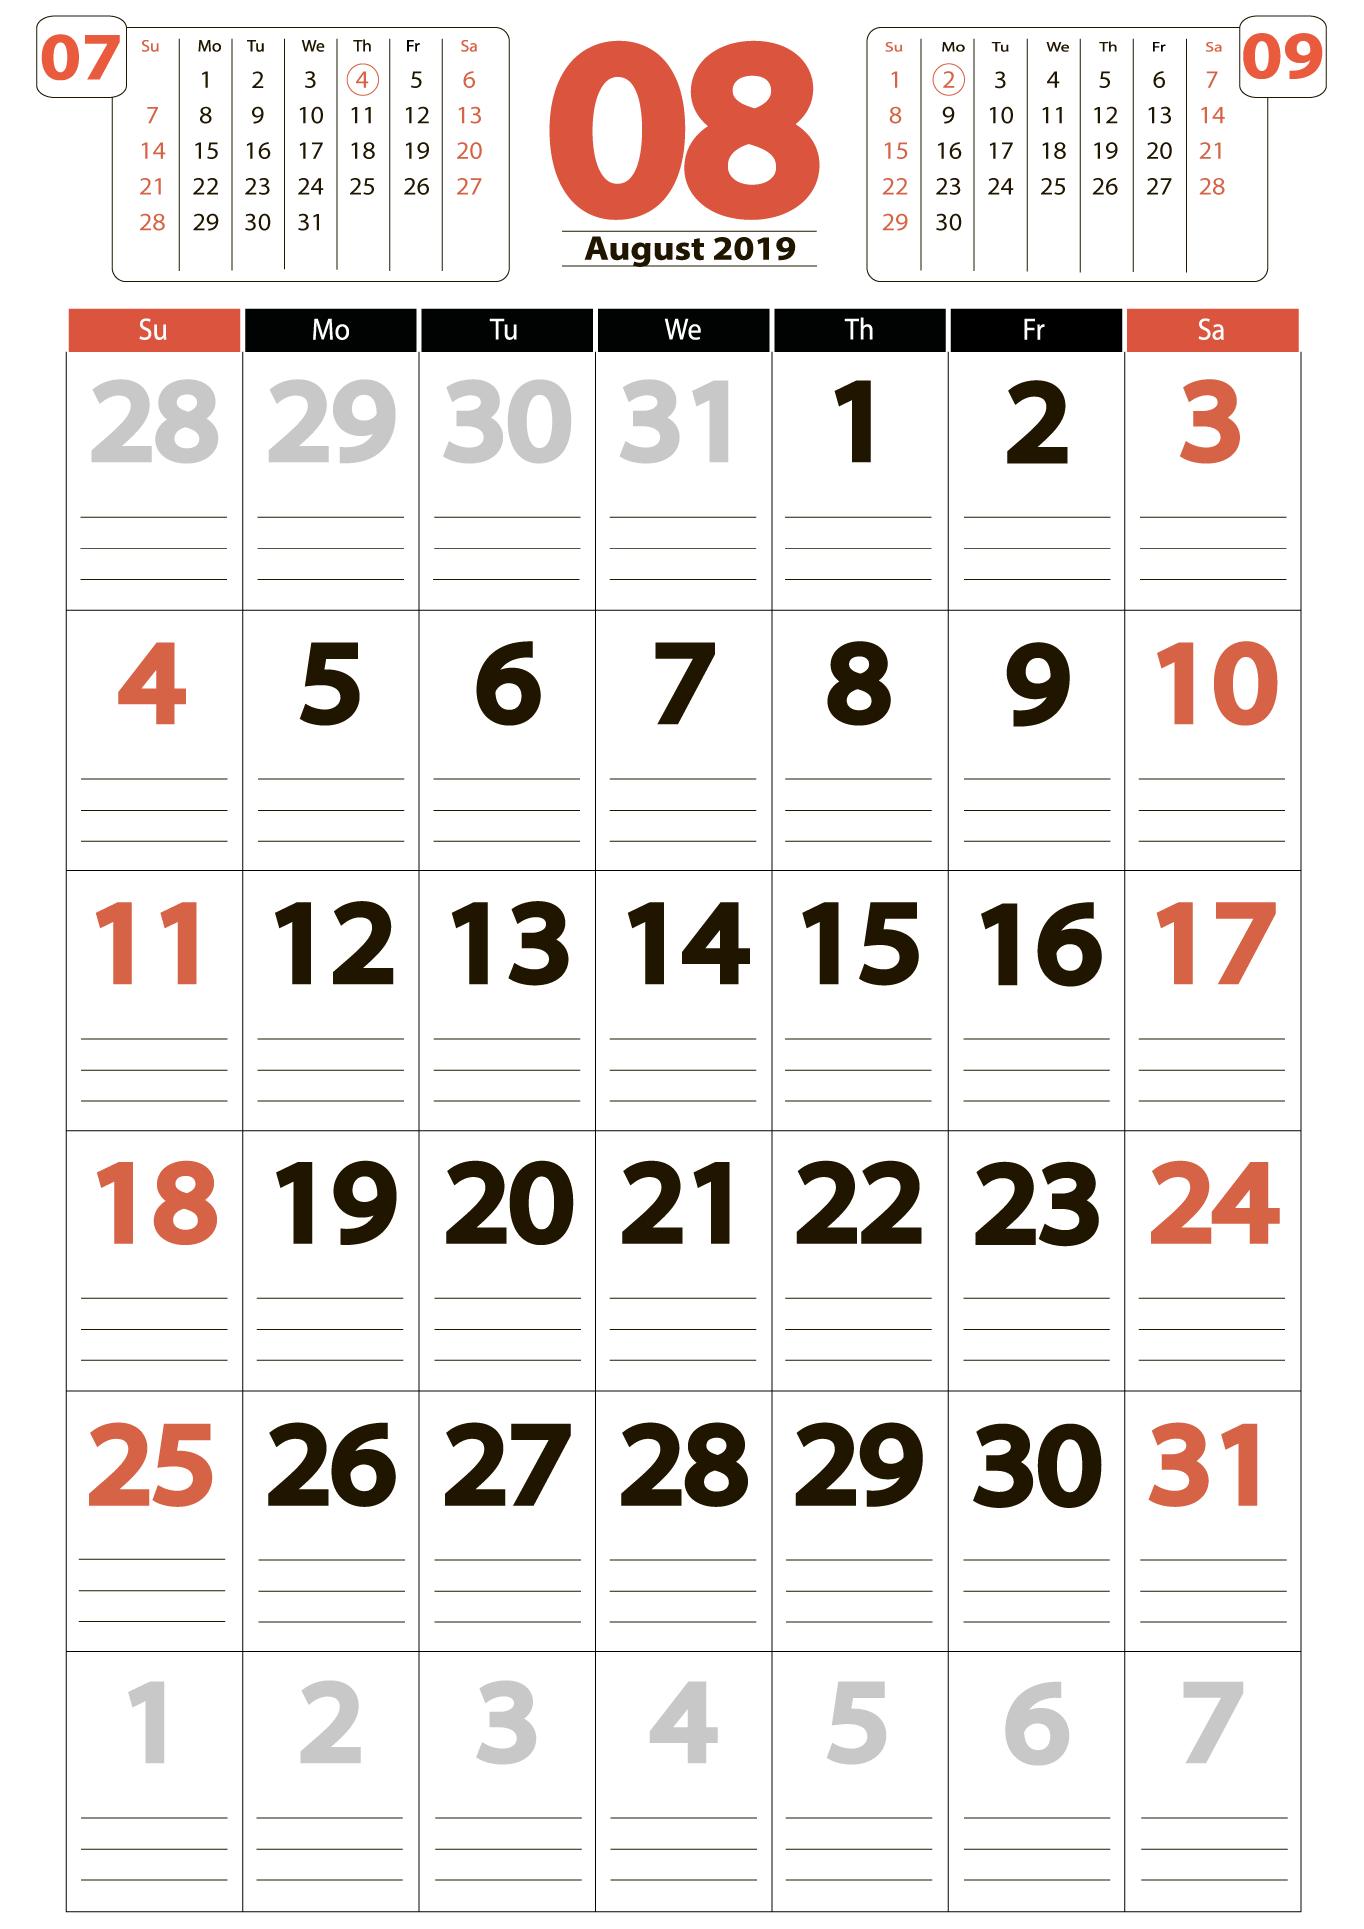 Download calendar 08 2019